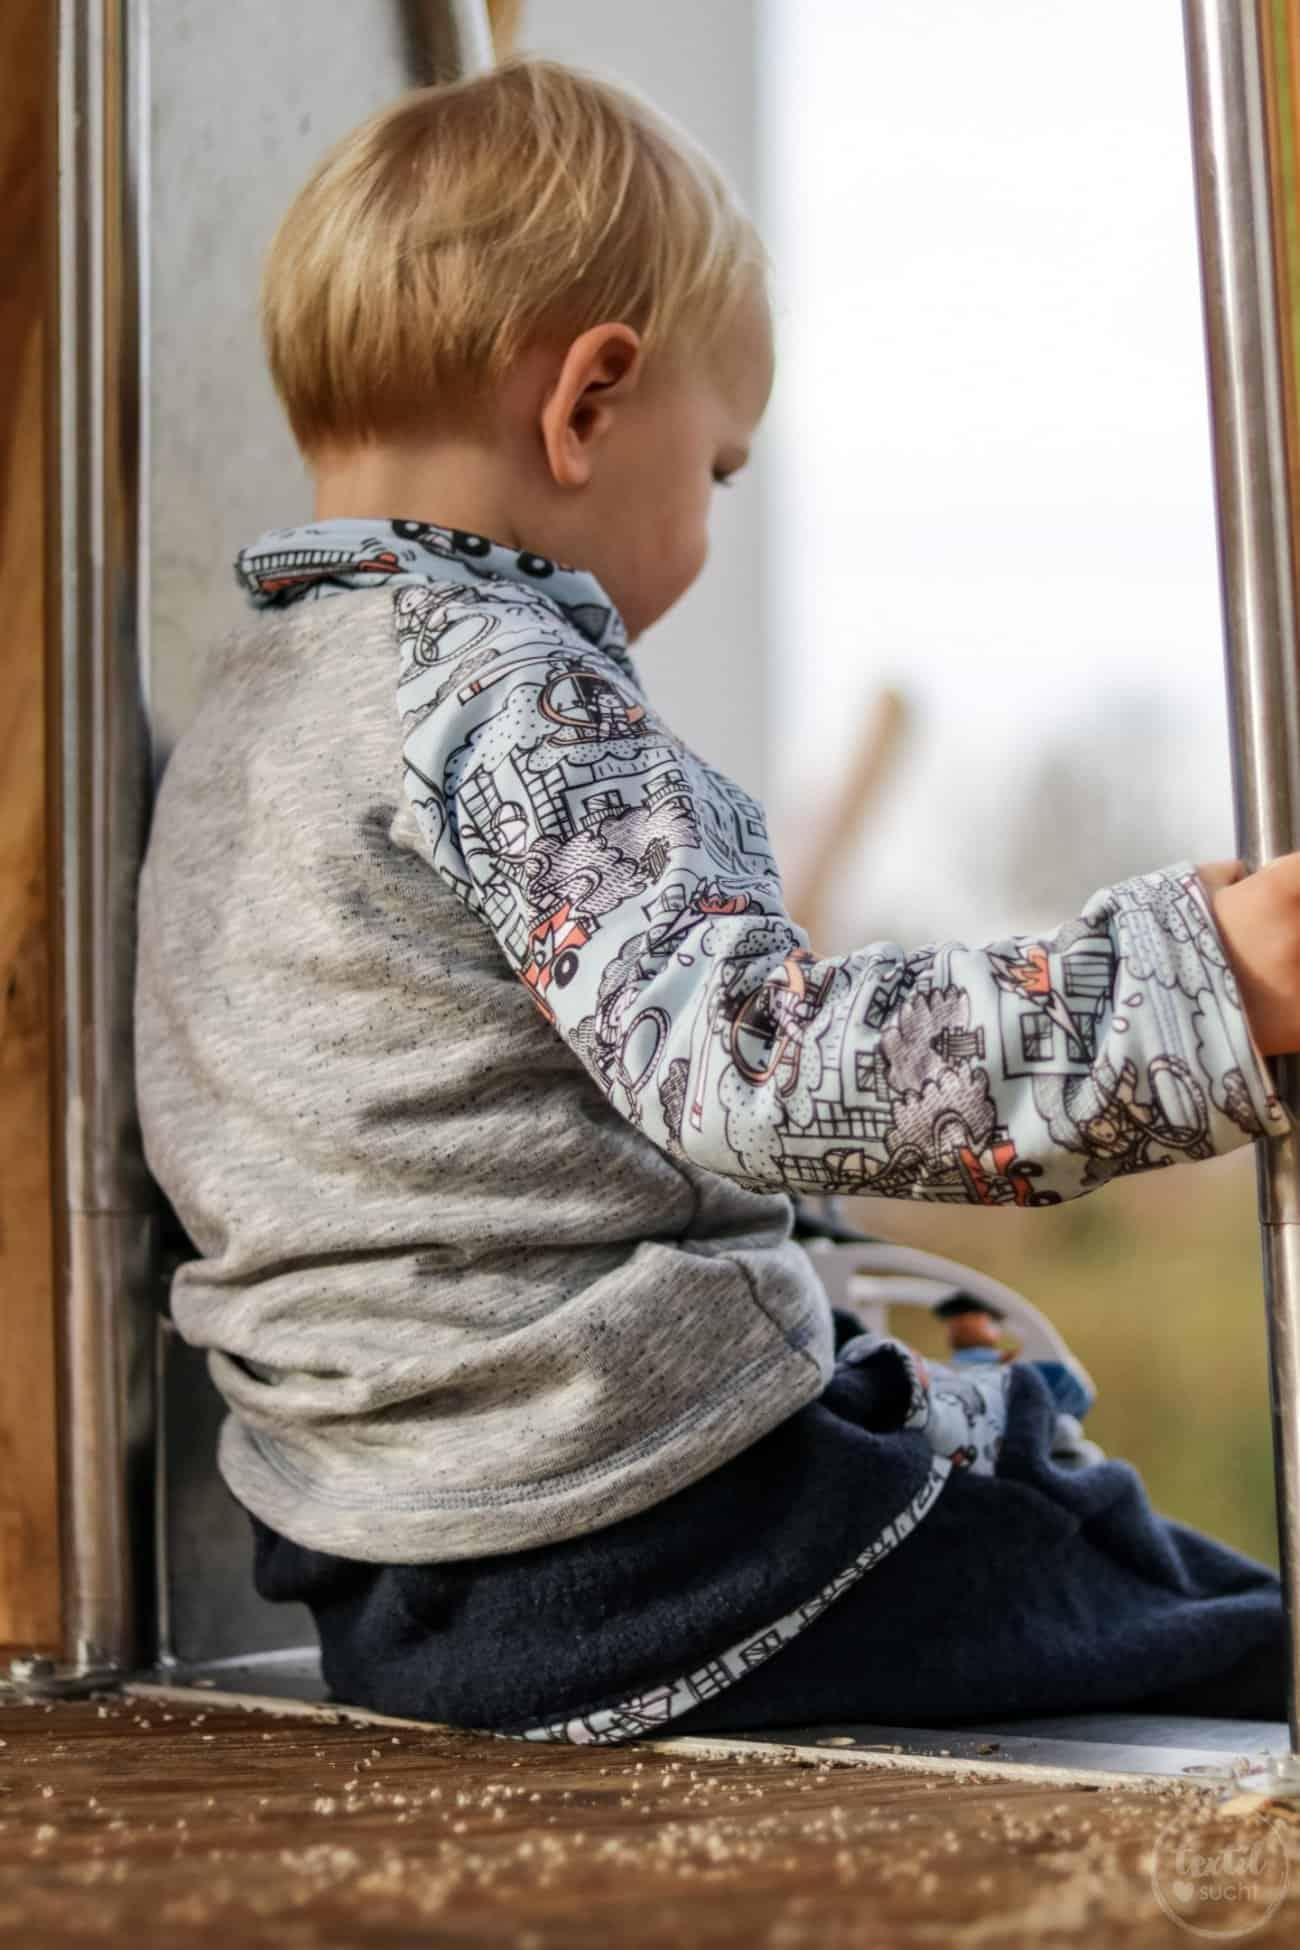 Kinderoutfit aus Walkhose und Sweater nähen - Bild 1 – textilsucht.de